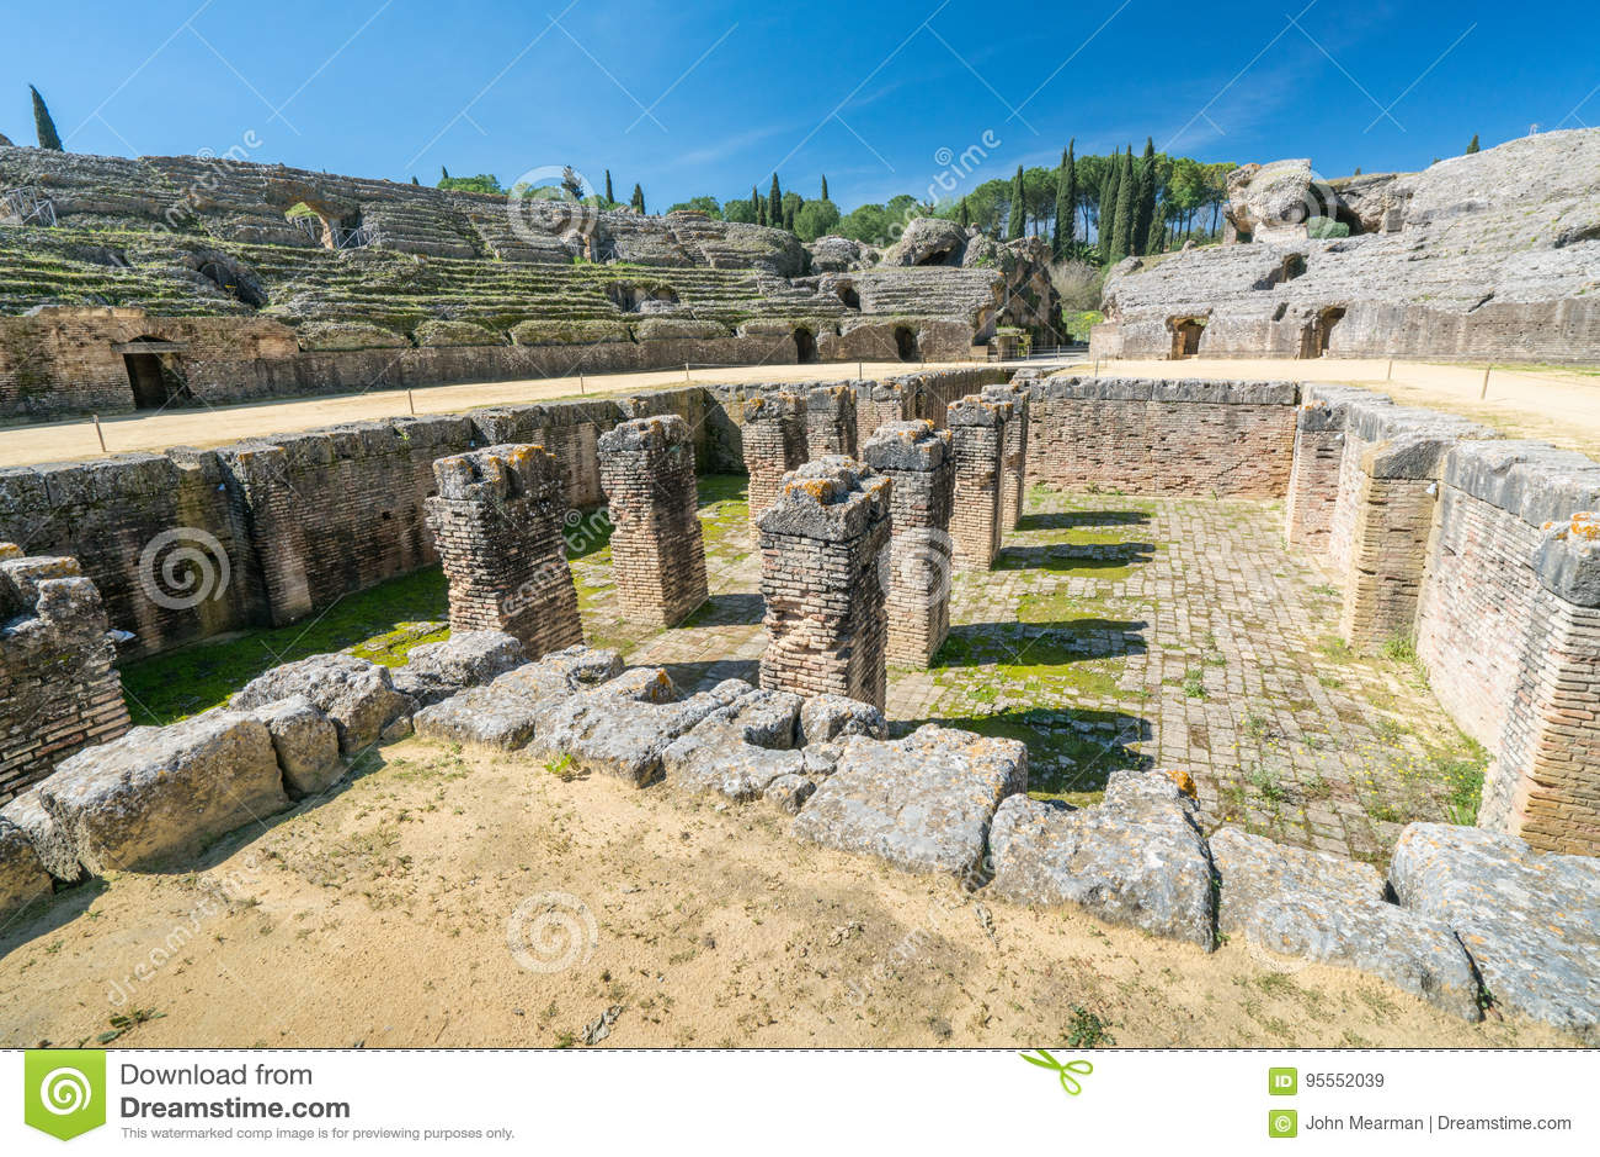 Italica Roman Ruins Spanien